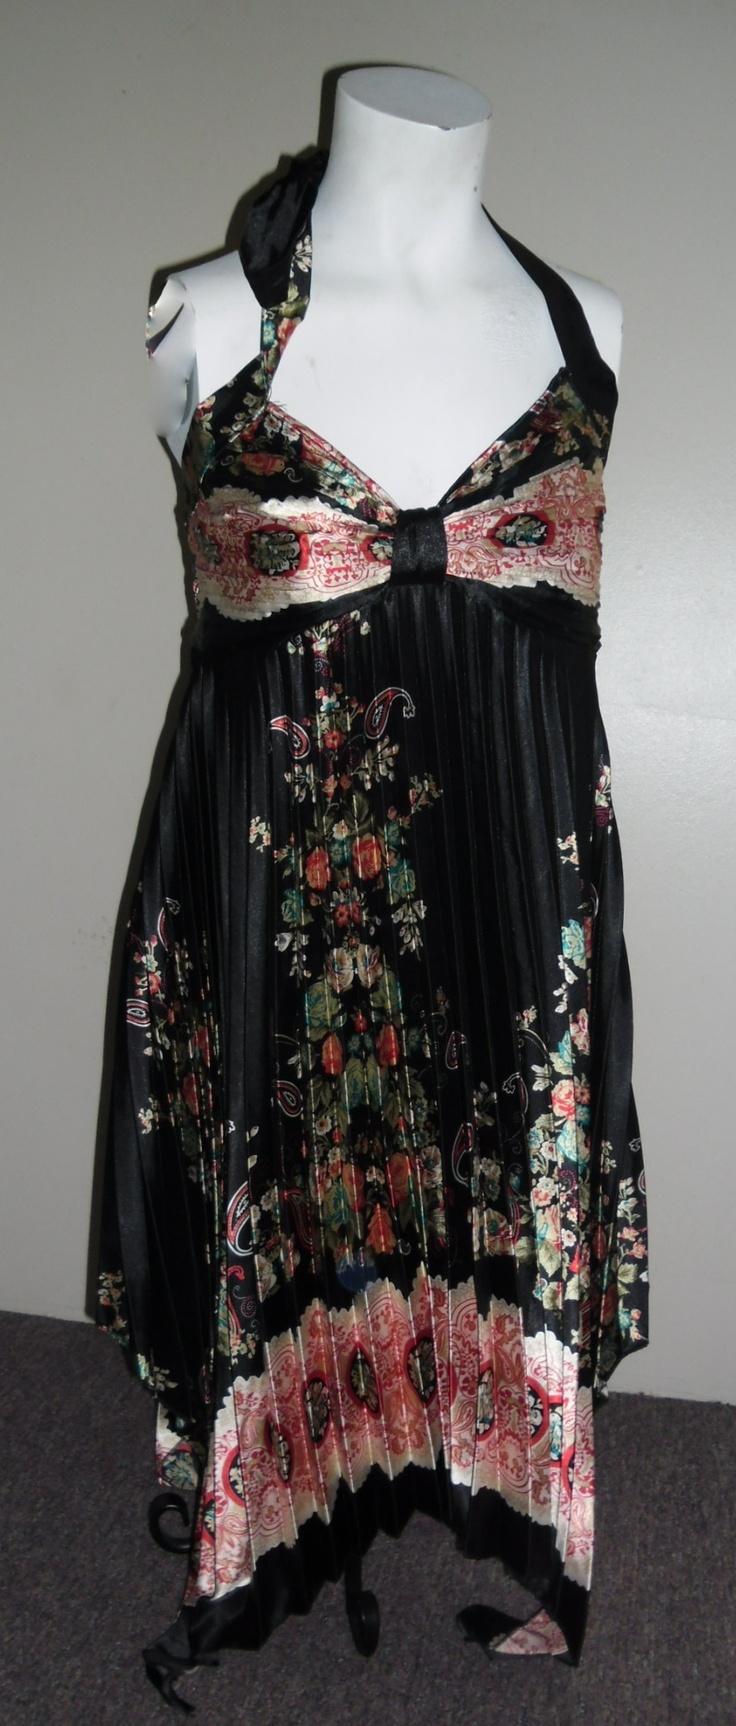 Pleated Halter Dress, Just so Pretty!